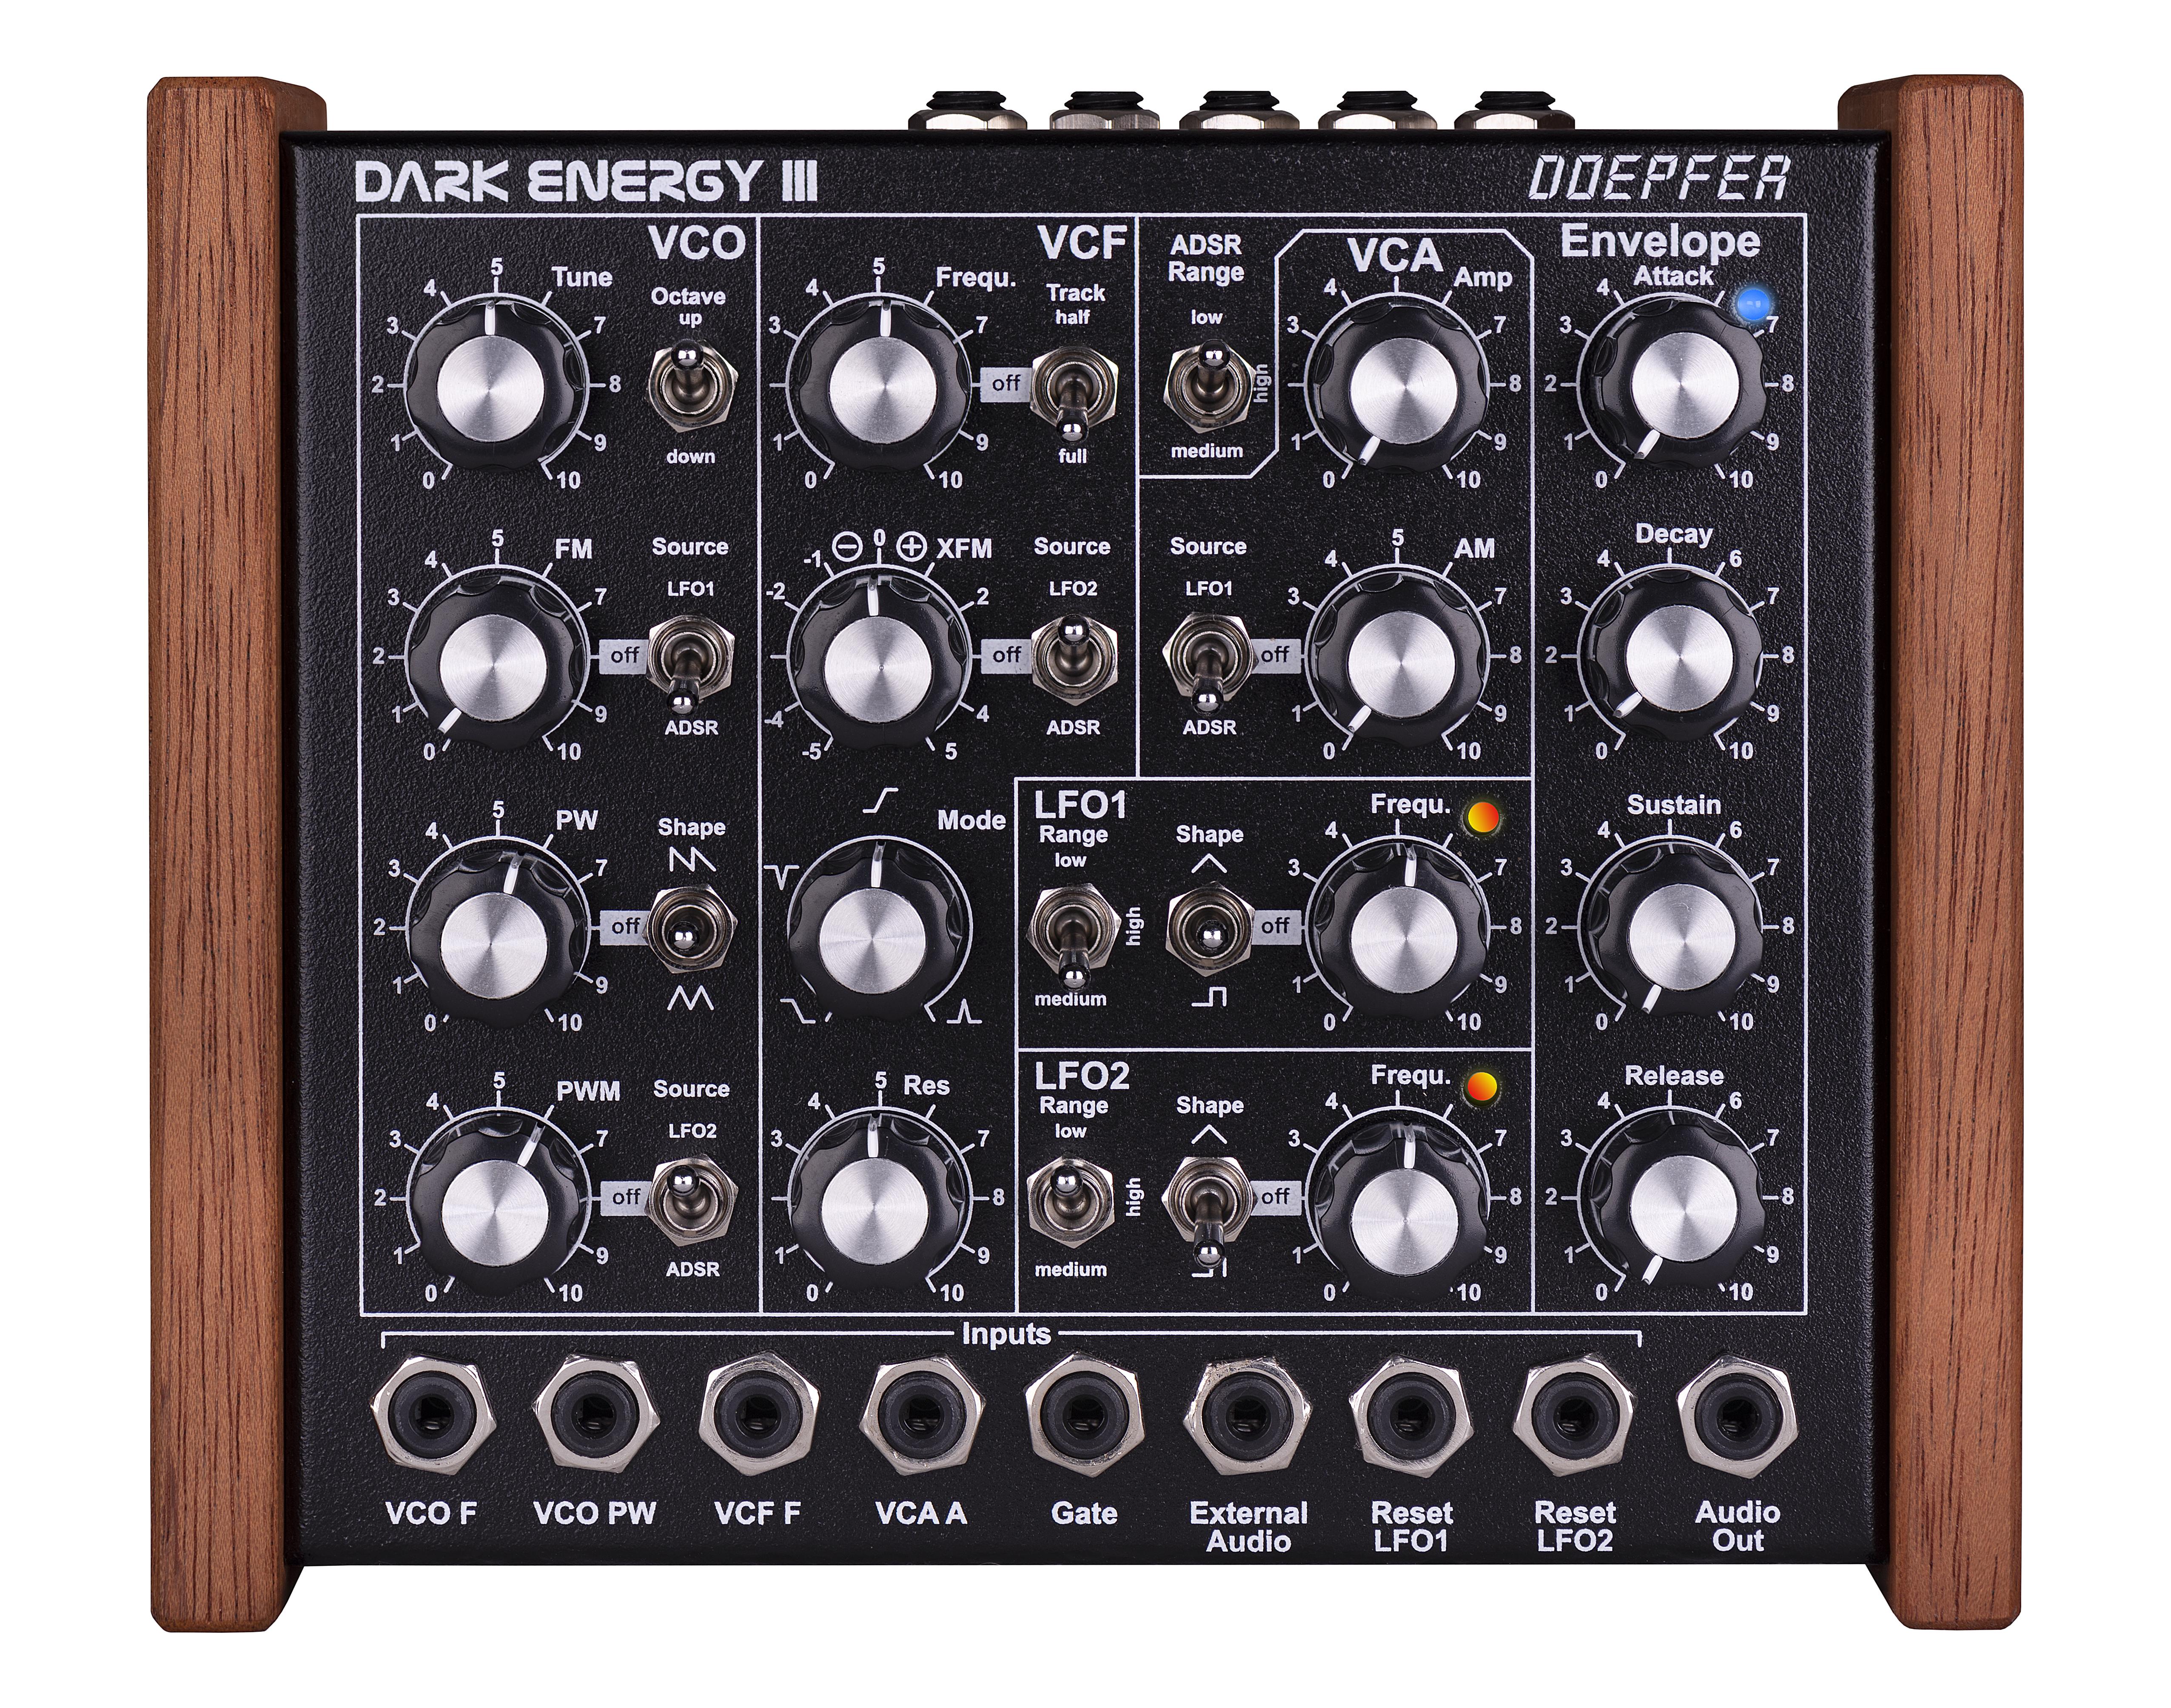 Dark Energy Iii Low Distortion Audio Range Oscillator